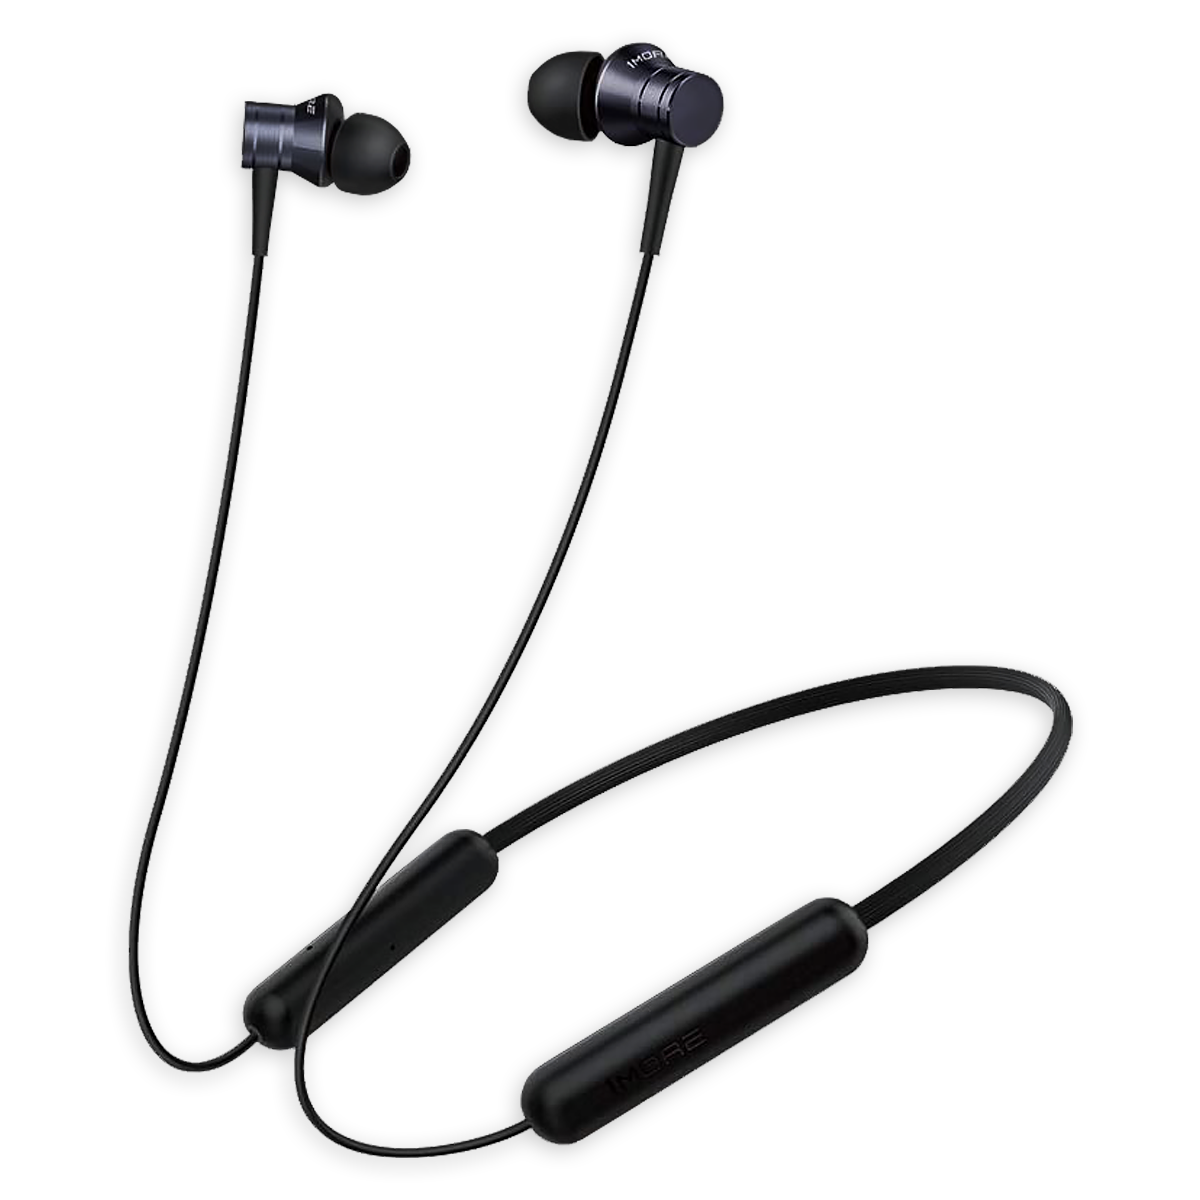 1MORE Piston Fit BT In-Ear Headphones (E1028BT)